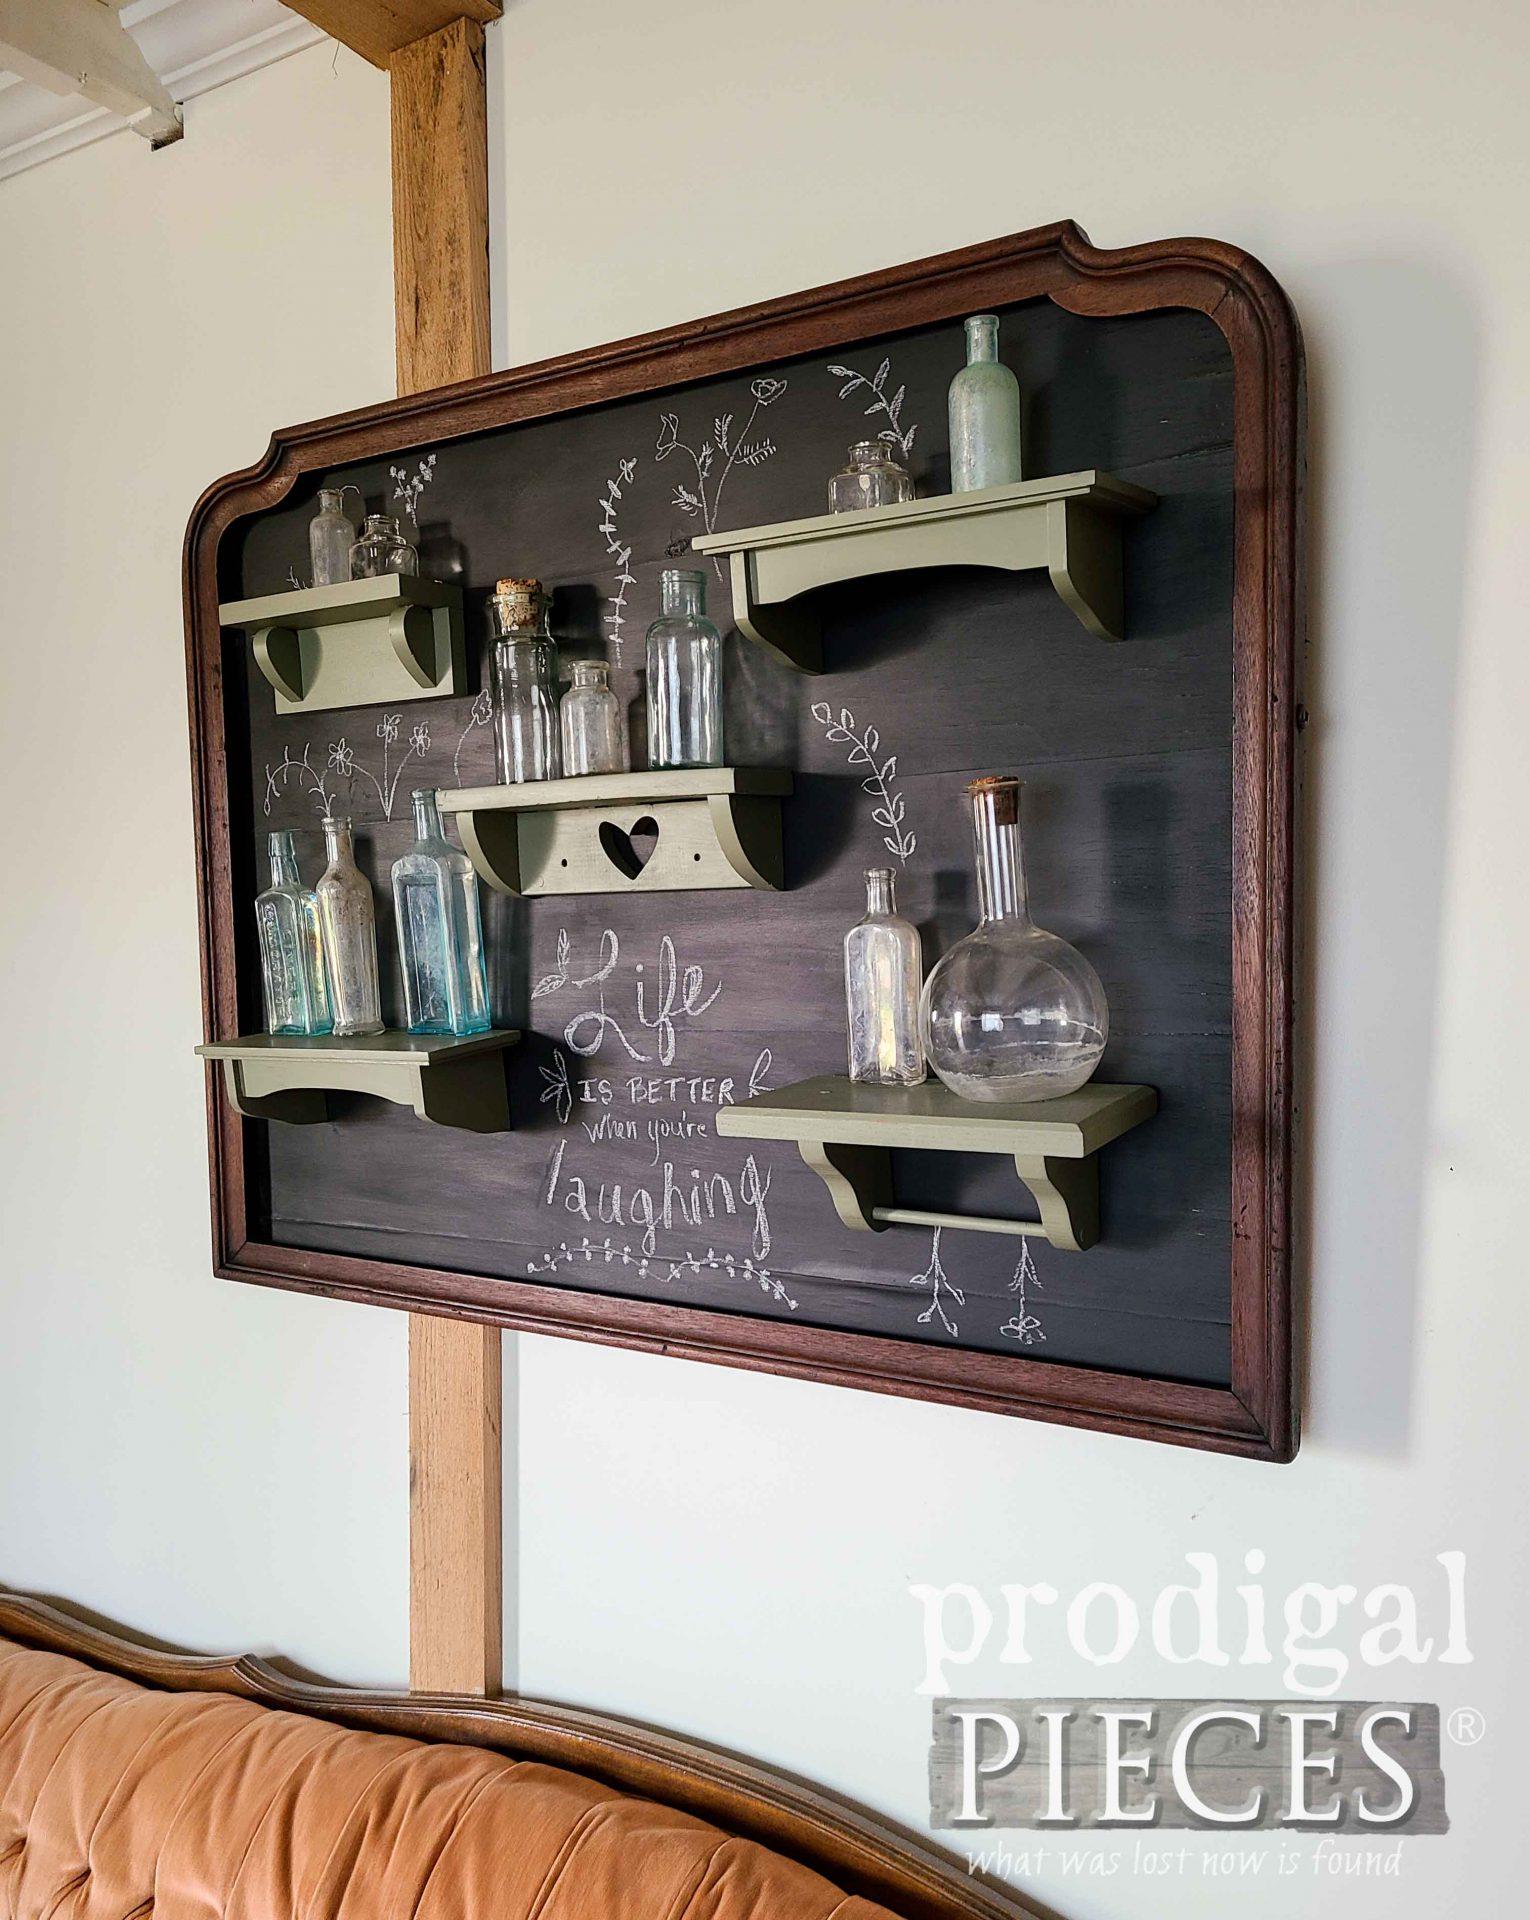 DIY Mirror Frame Wall Art by Larissa of Prodigal Pieces | prodigalpieces.com #prodigalpieces #diy #home #vintage #wallart